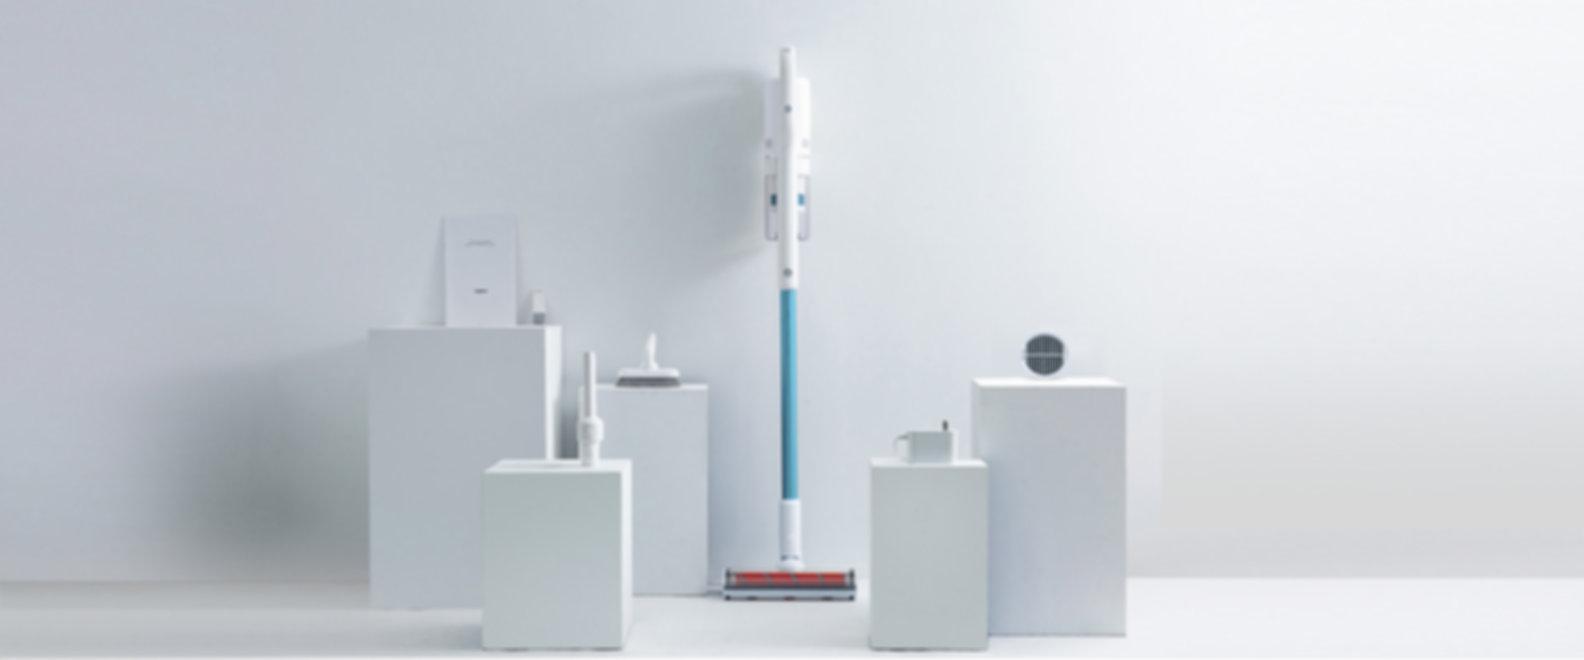 f8 storm fx cordless vacuum cleaner.jpg